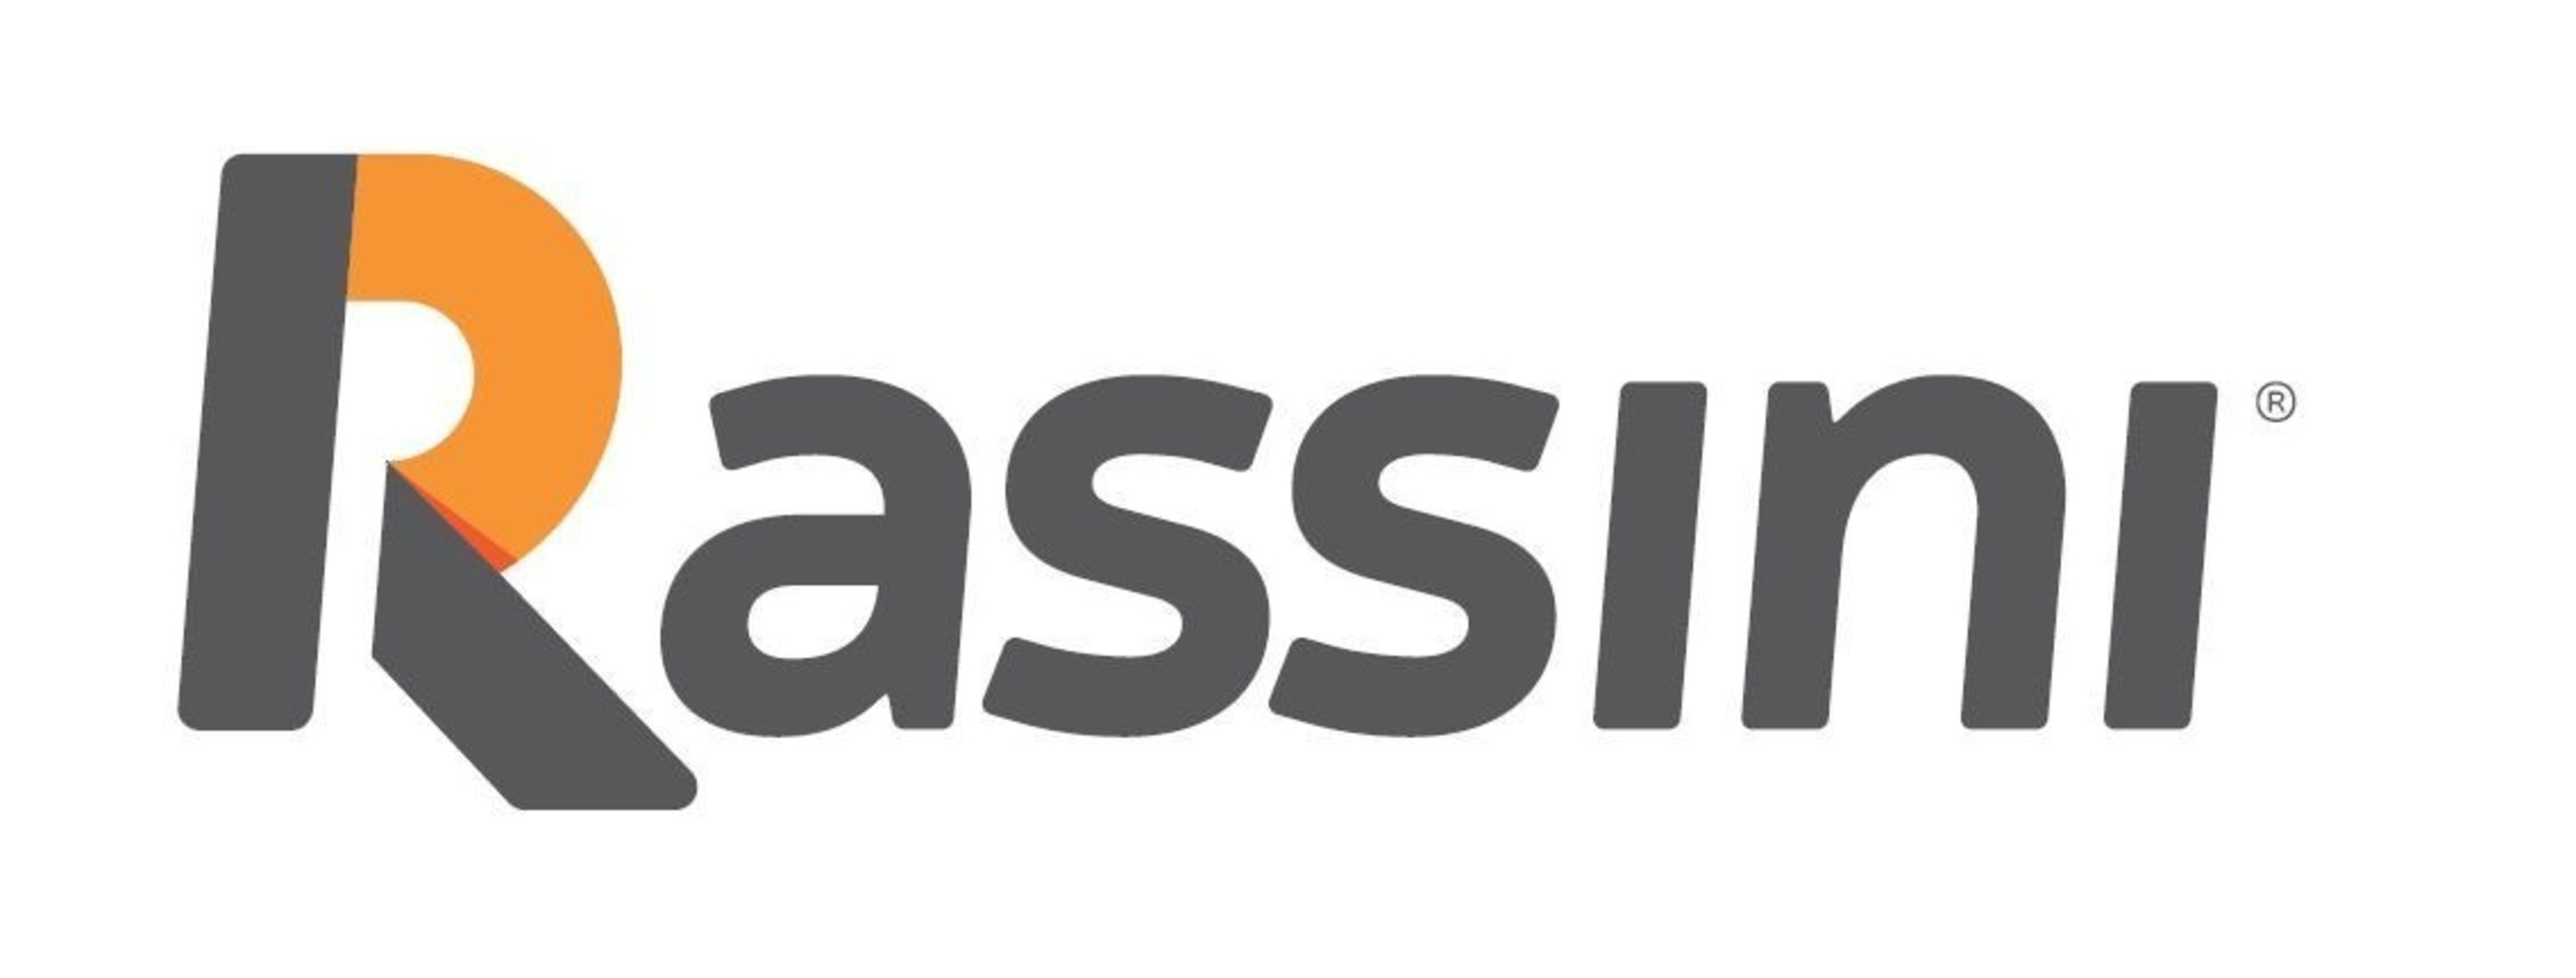 "Die SANLUIS Corporacion, S.A.B. de C.V. ändert ihren Namen in ""Rassini'"